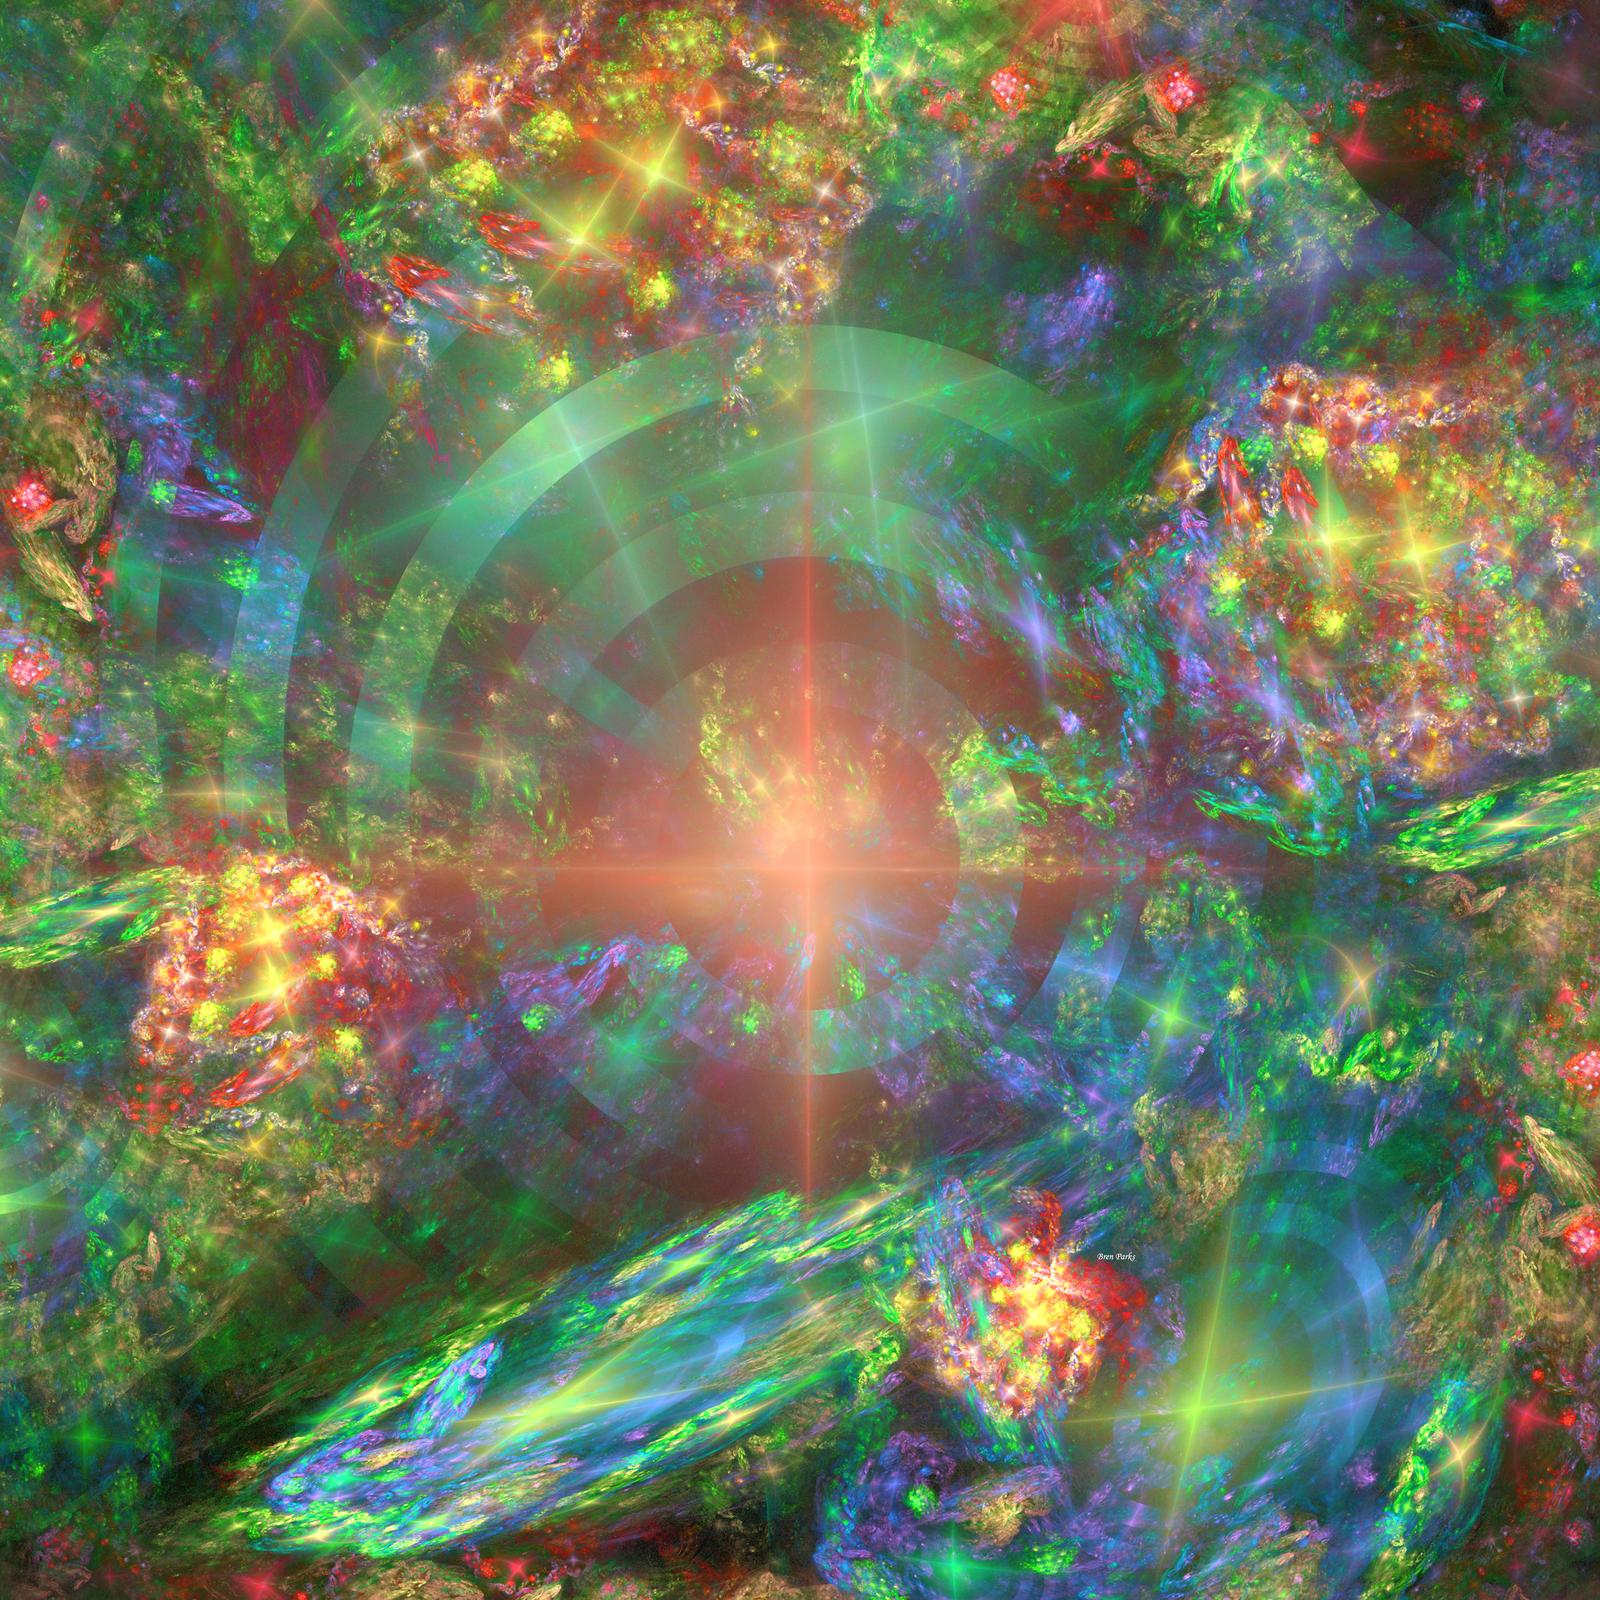 The Heaven Nebula by MysticBren on DeviantArt